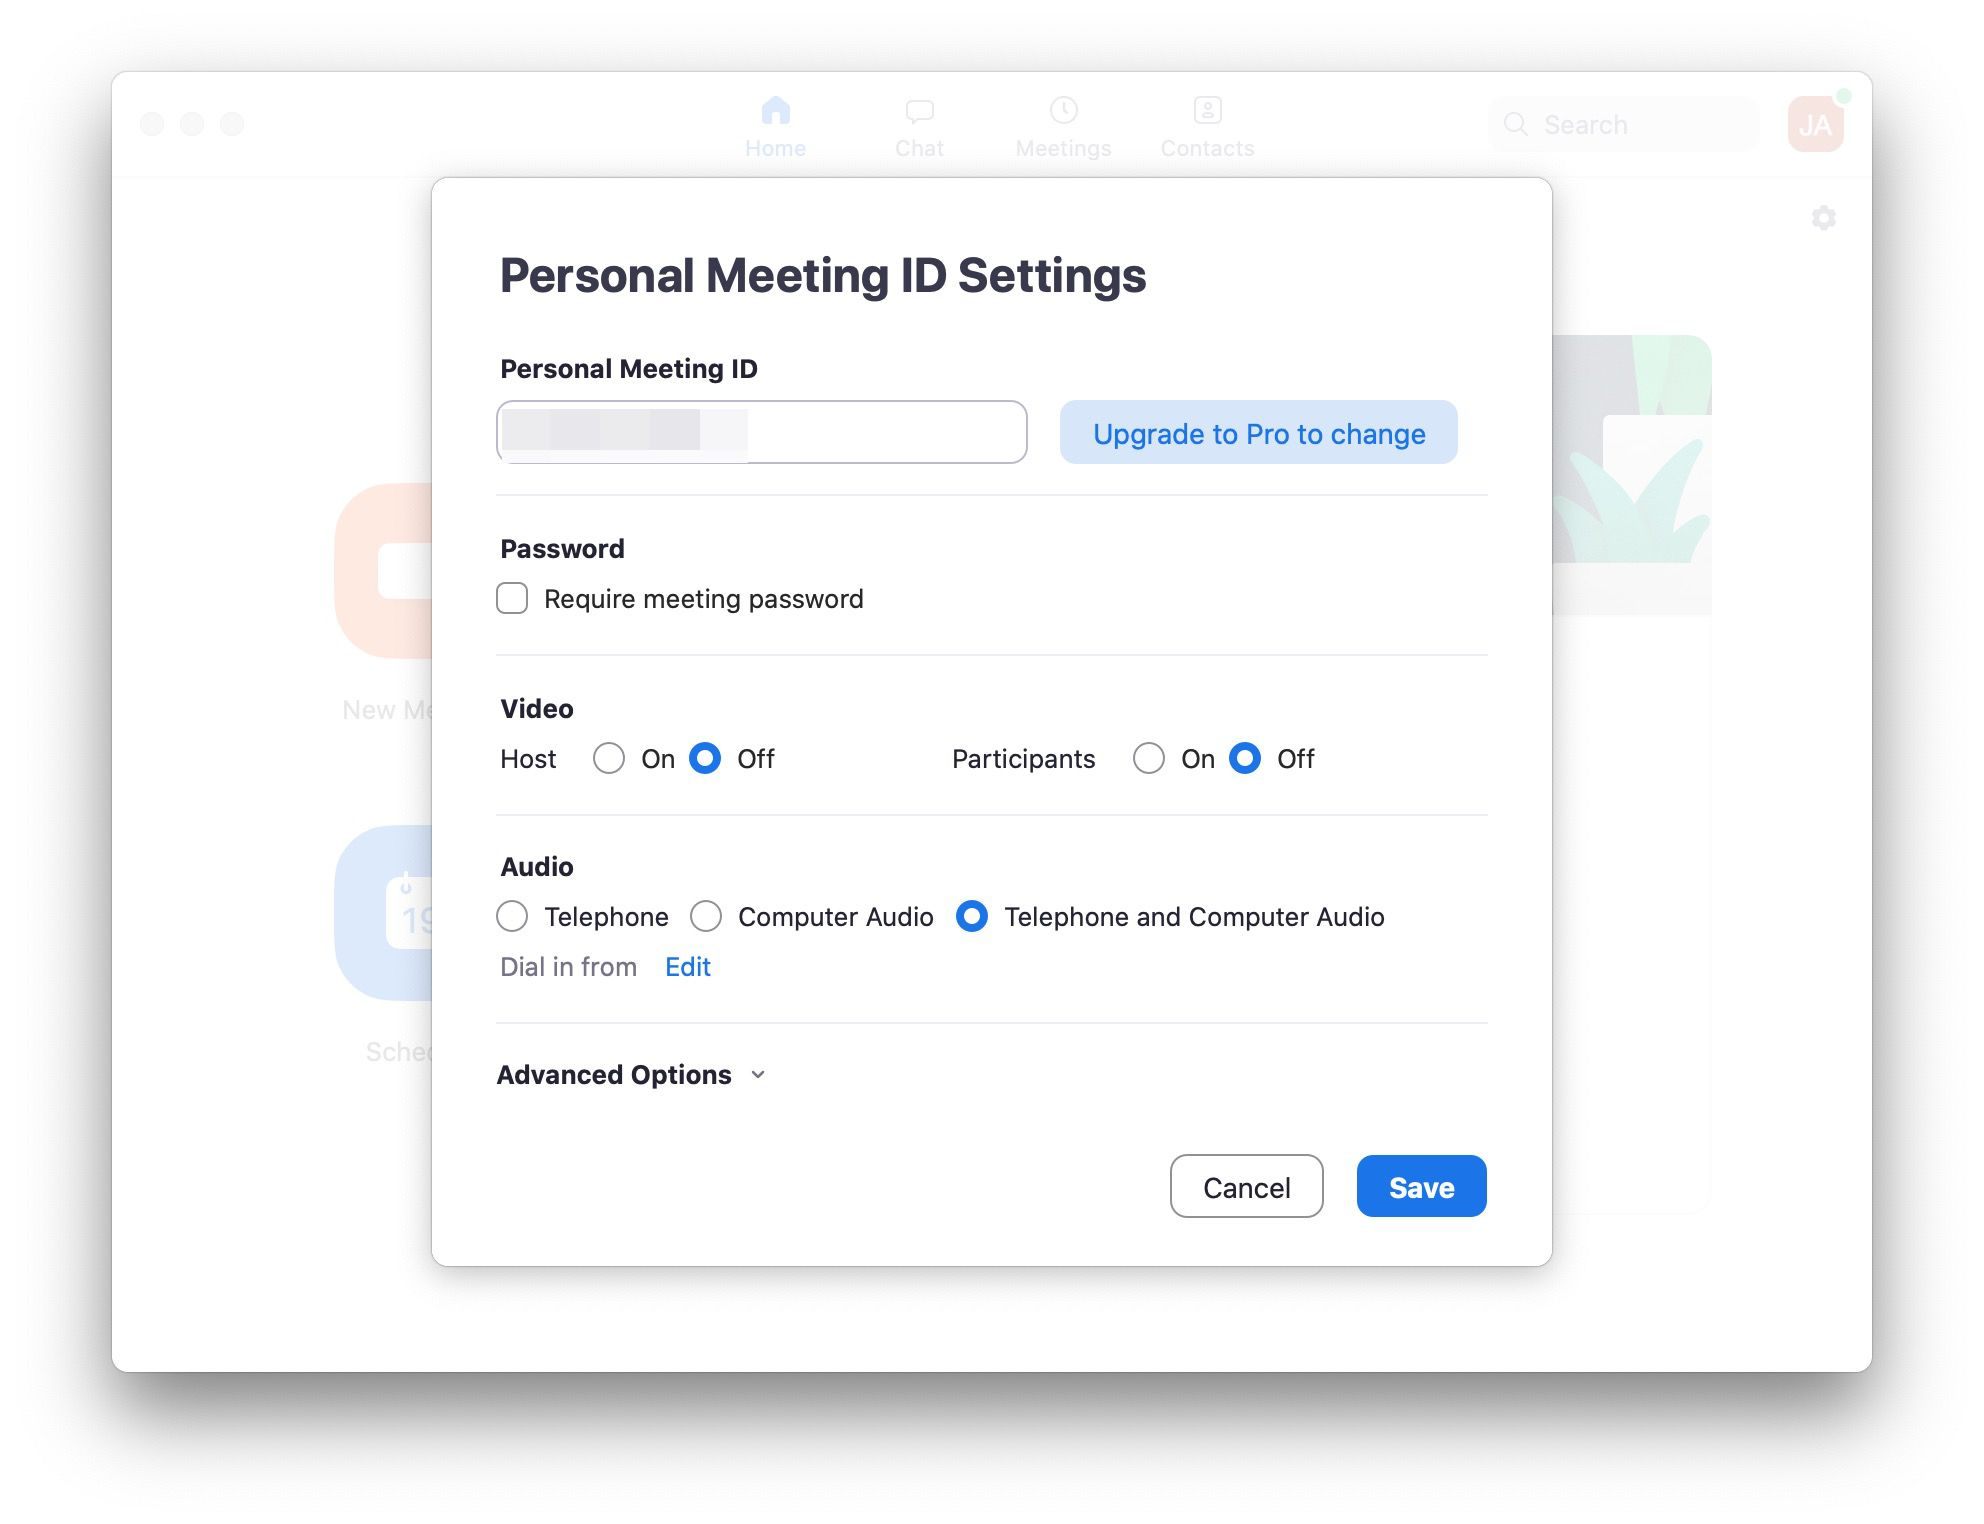 Zoom app with Passworded meeting displayed